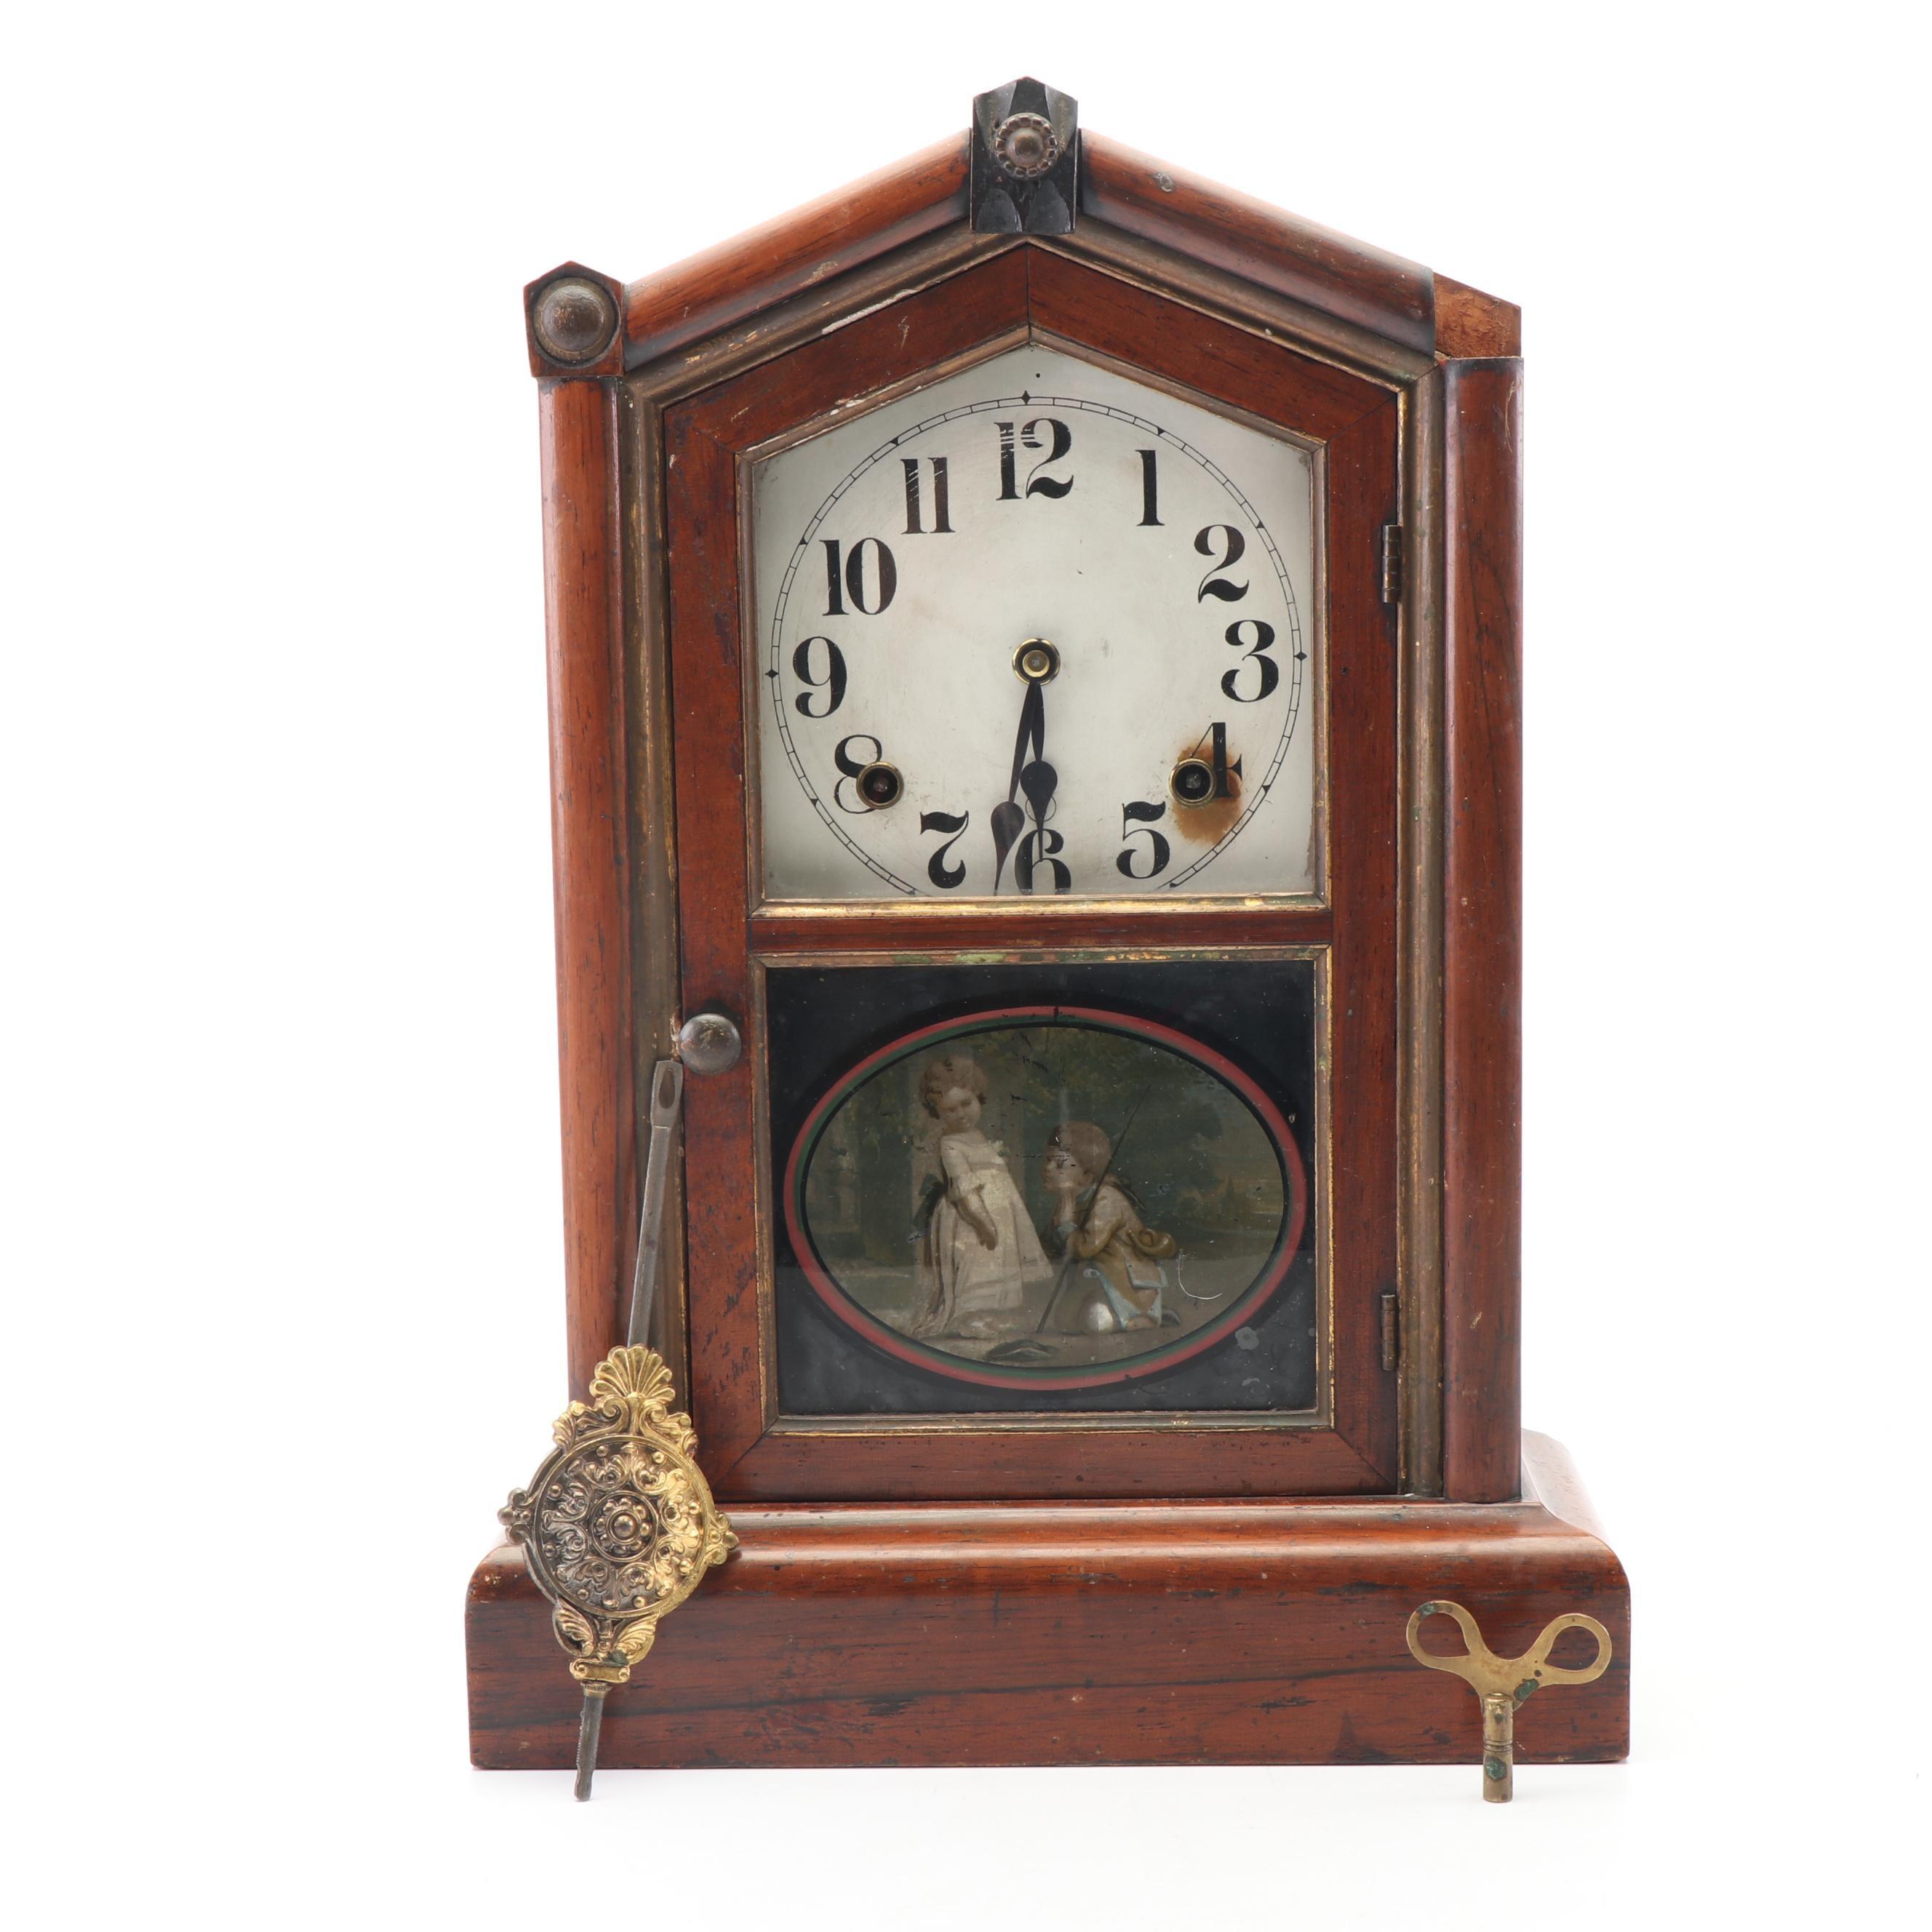 Seth Thomas Mahogany Case Spring Driven Mantel Clock, Late 19th Century